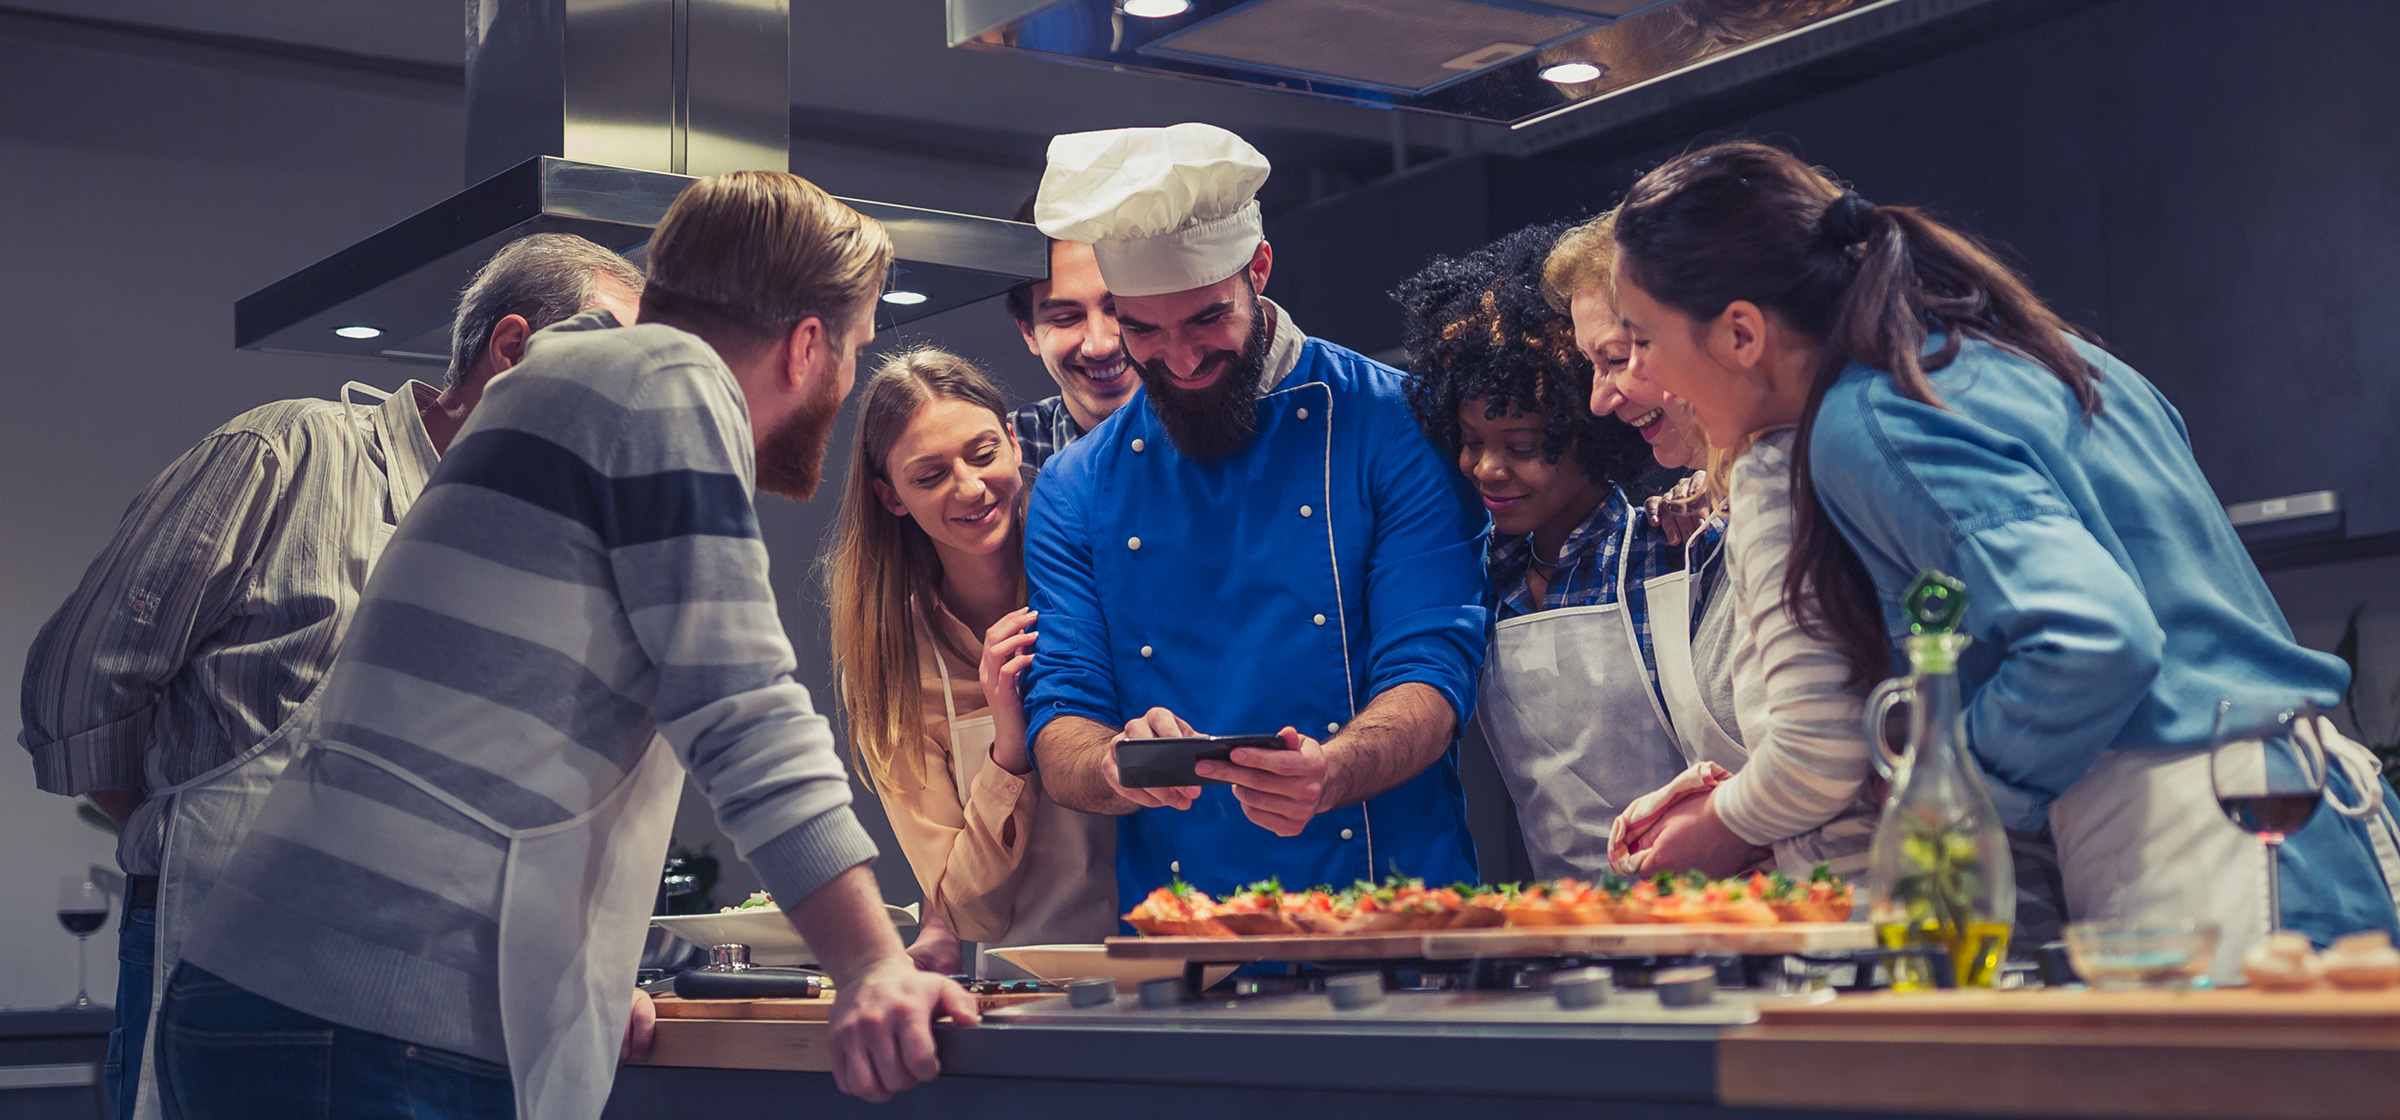 Ascaya-experiences-culinary